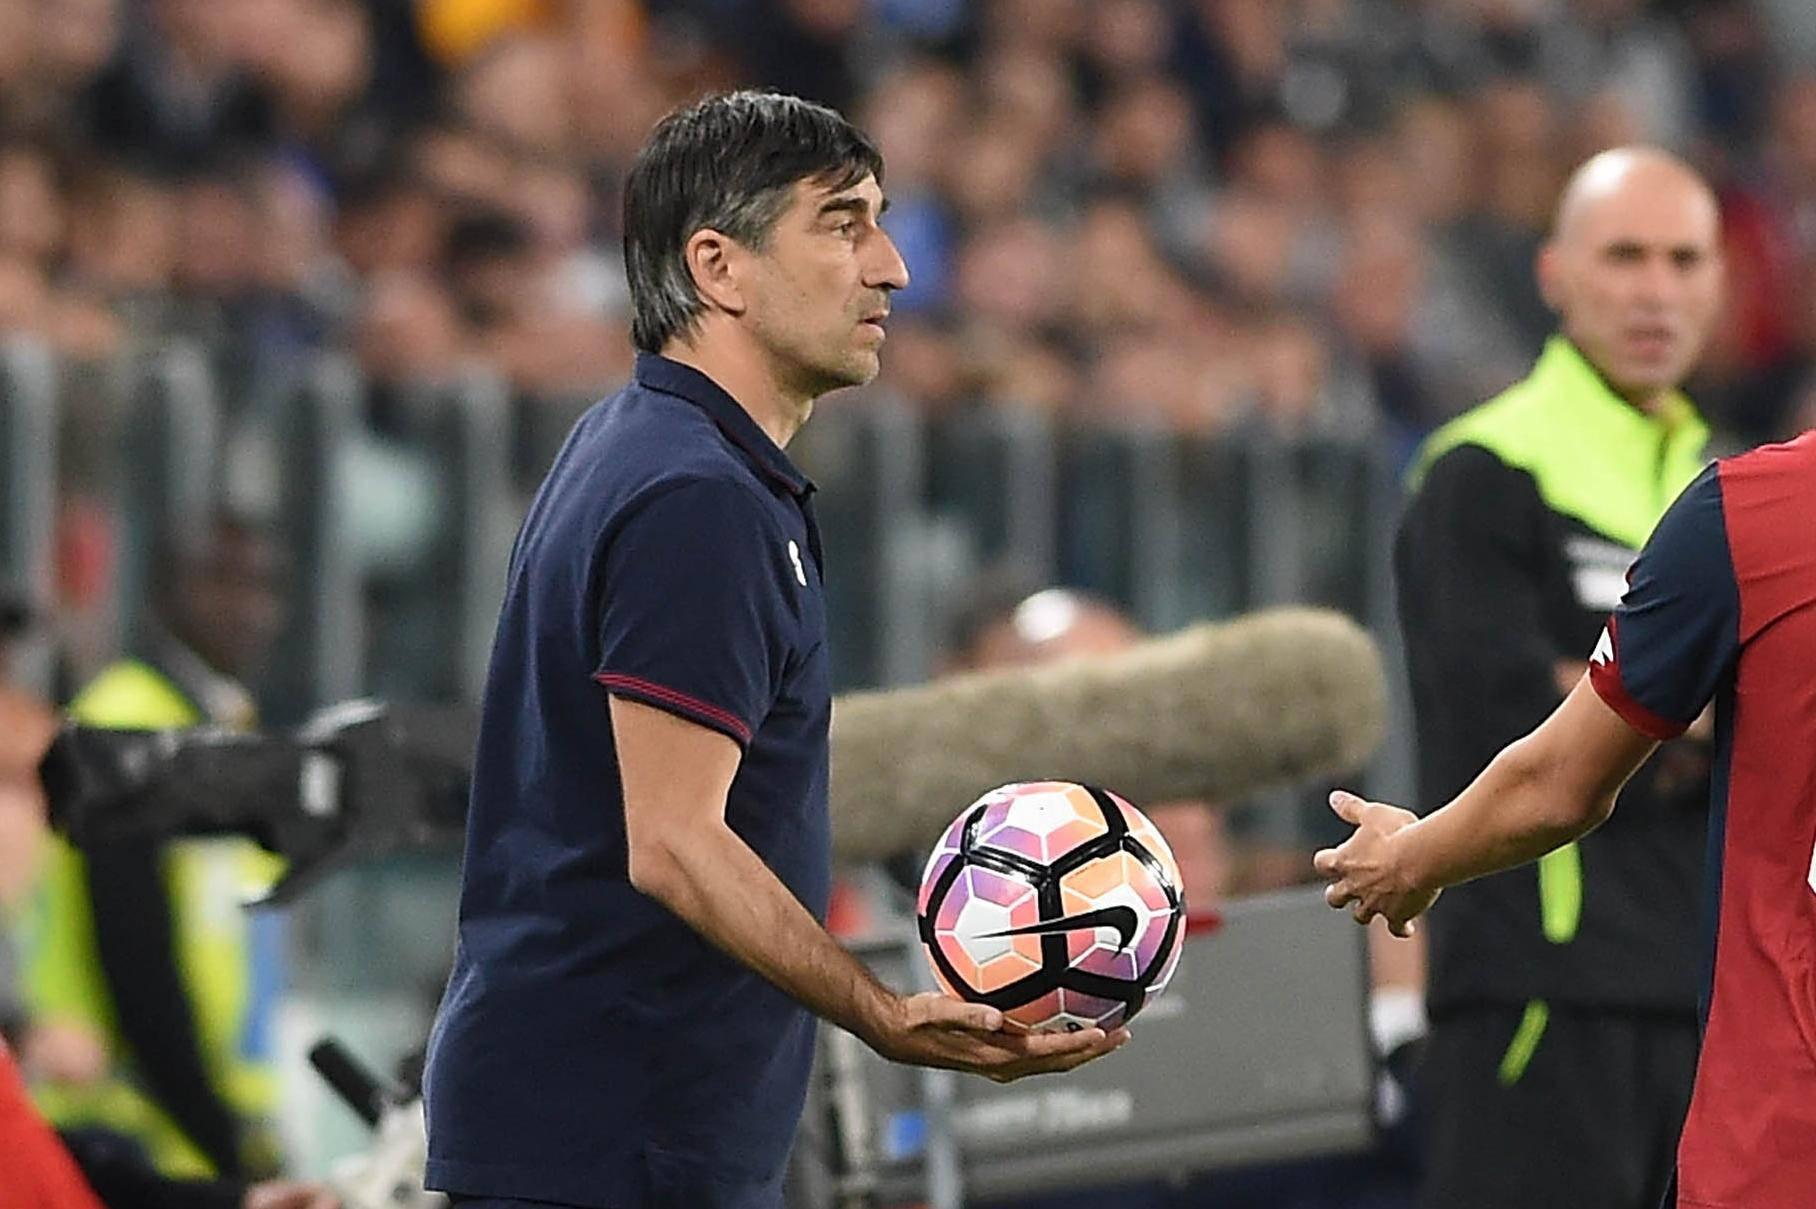 #IPP20170423# Football - soccer: Serie A, Juventus Turin - CFC Genua 1893